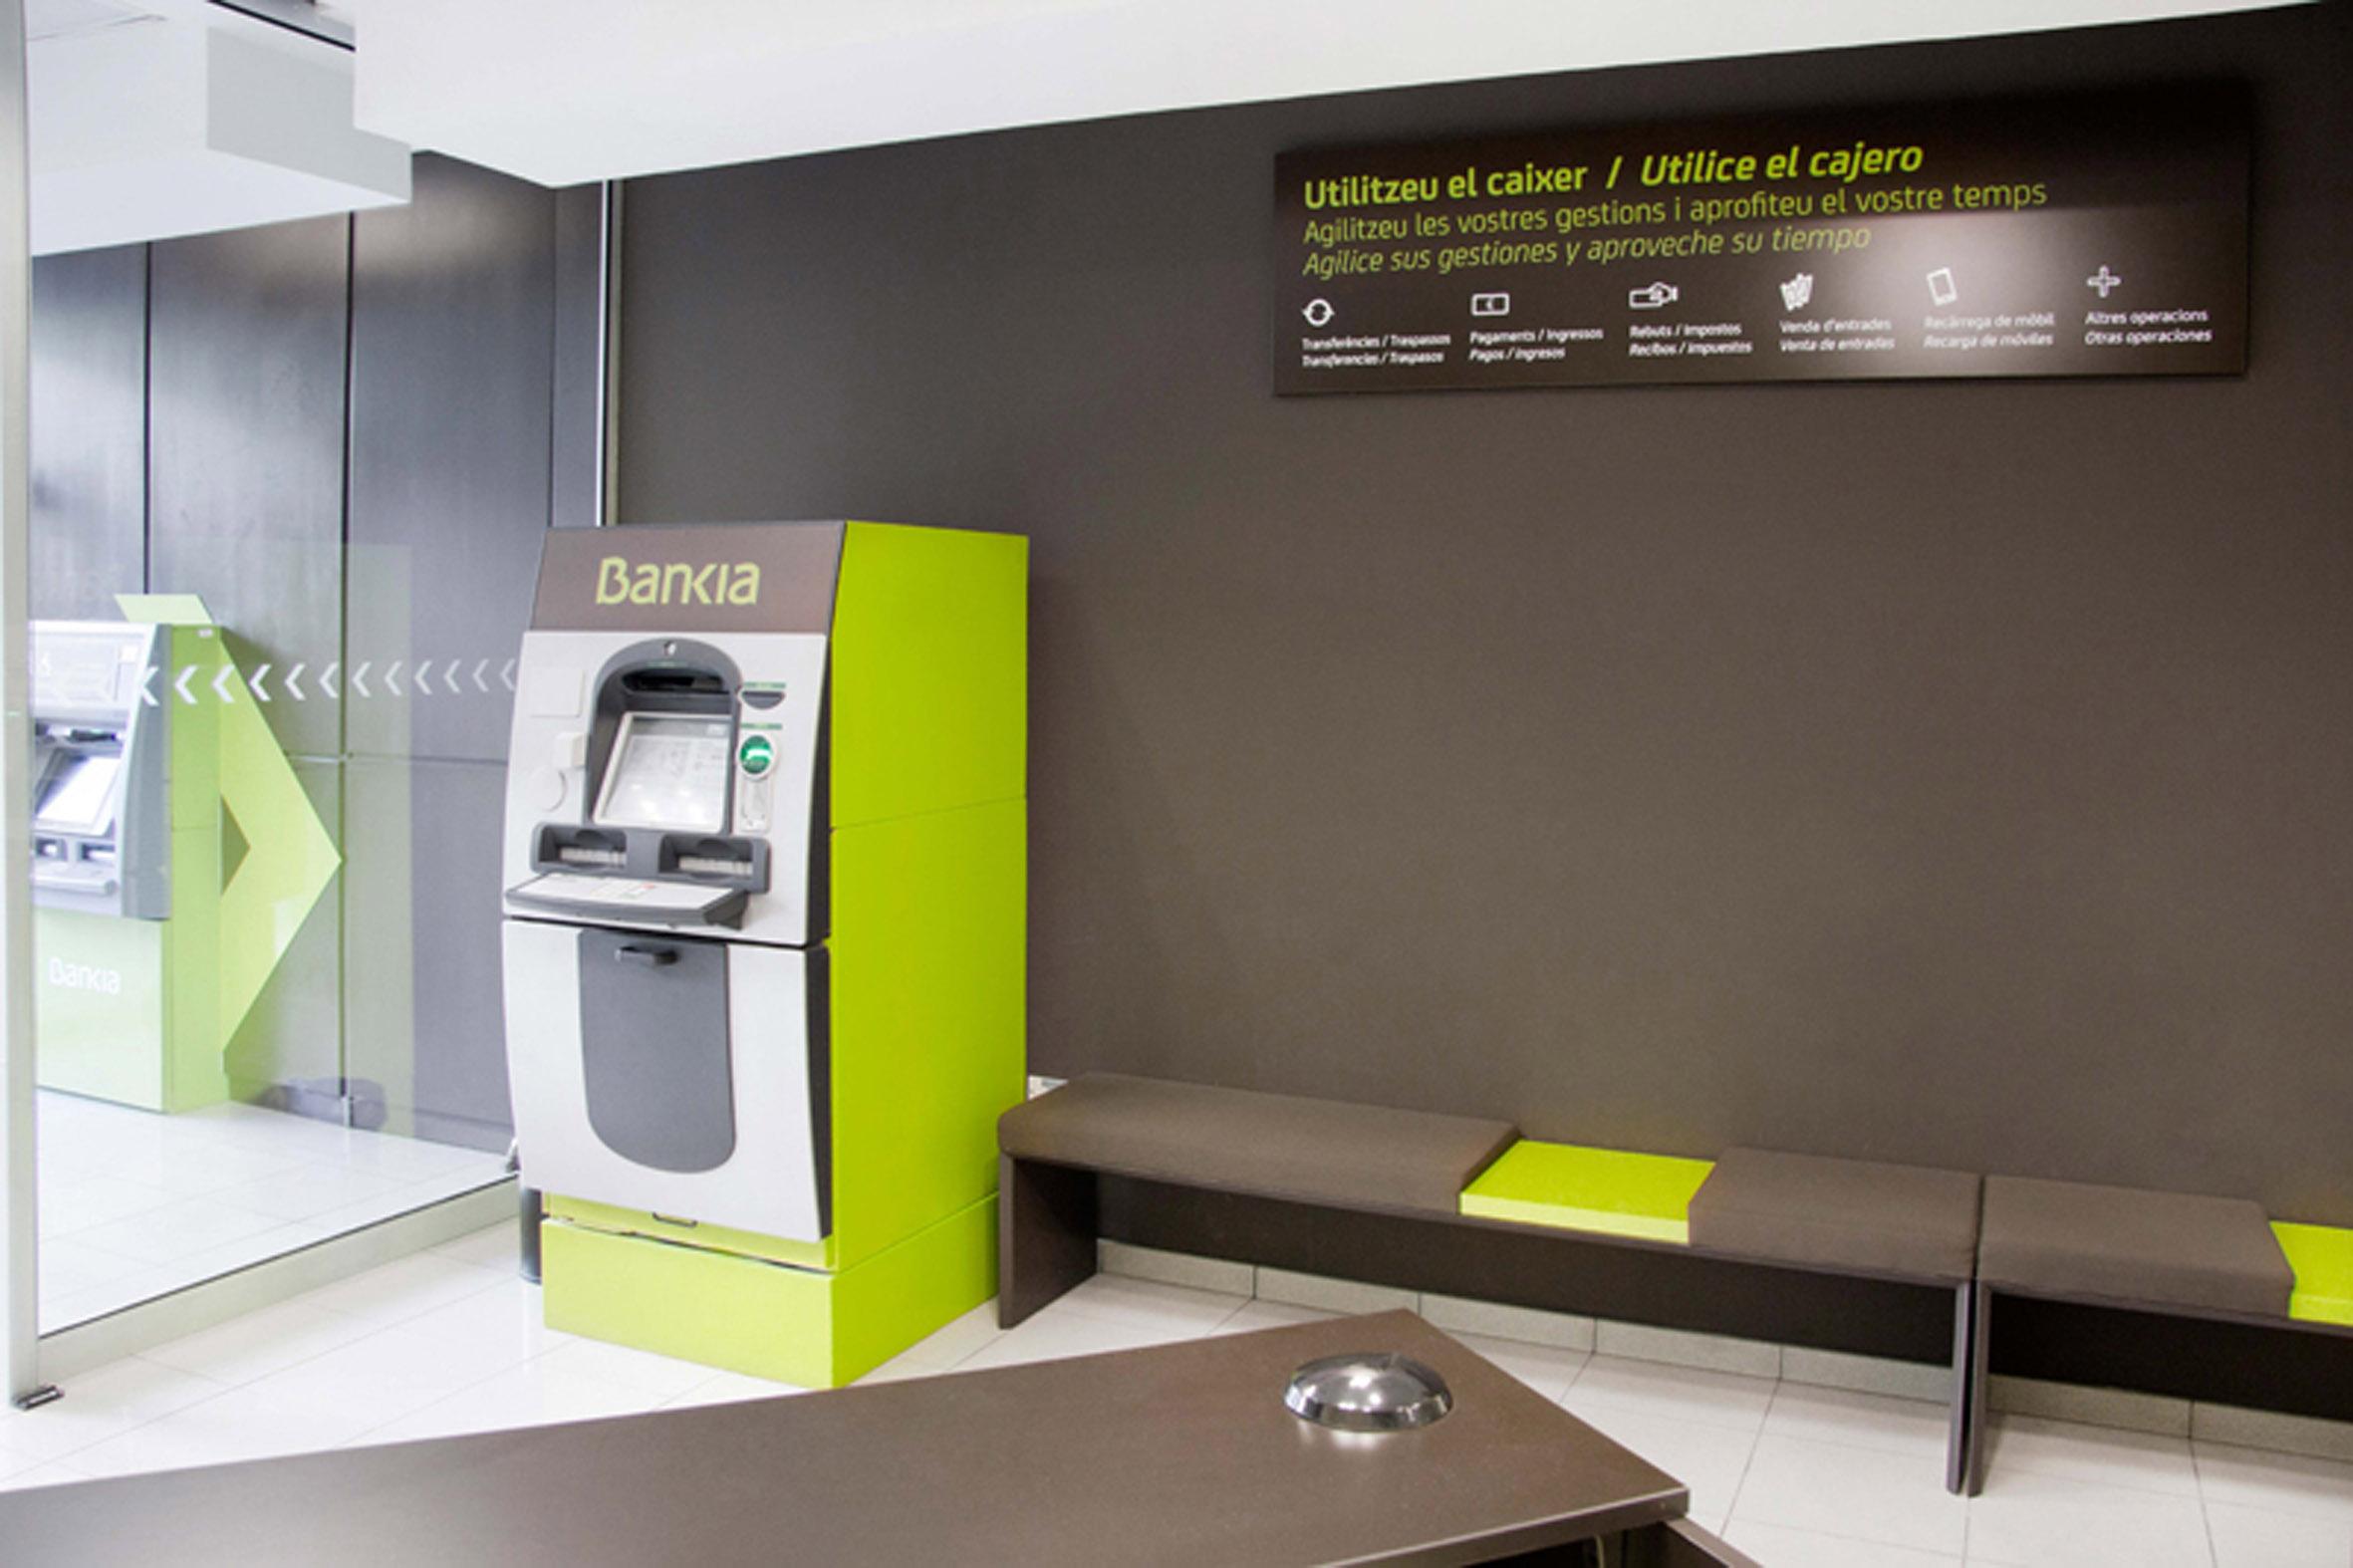 Bankia agil 04 dise o for Oficina 7020 bankia